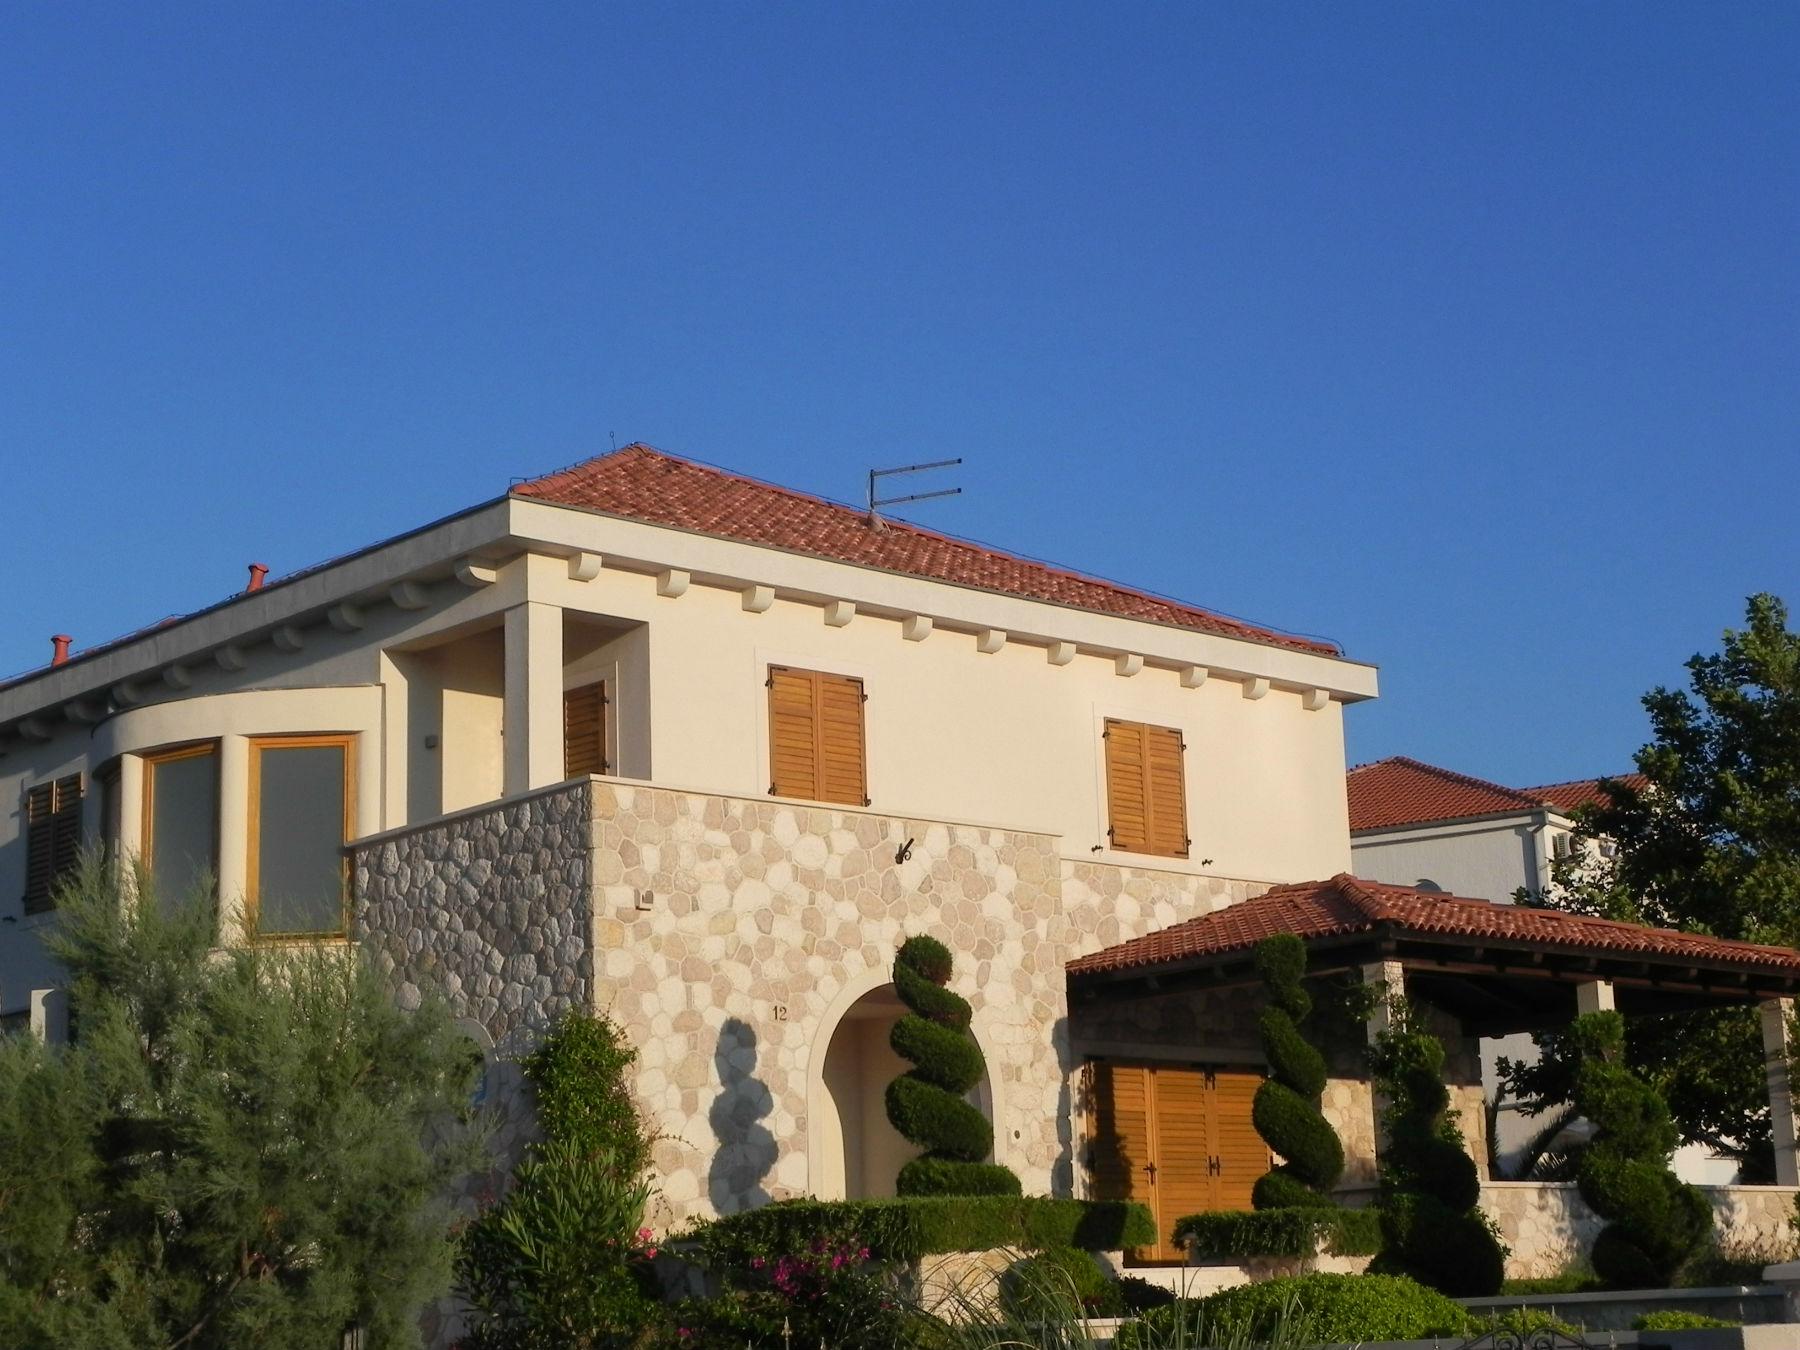 otok murter - nova hiša